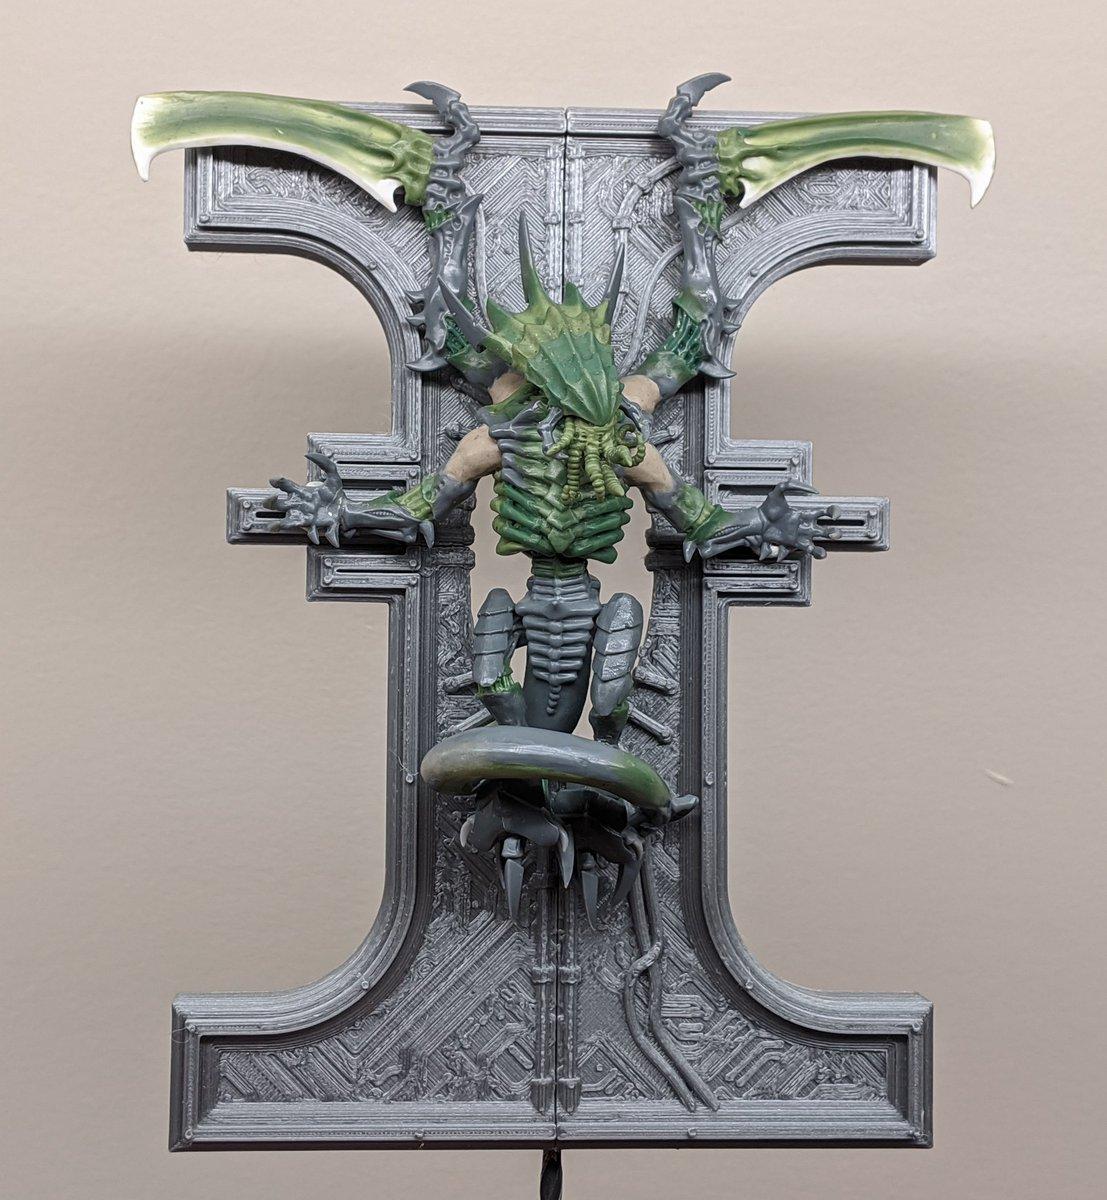 Well. I'd say the crucified Tyranid Prime is finally donezo!  #Tyranids #WarhammerCommunity #warmongers @WarComTeam https://t.co/685Wa0mjwf